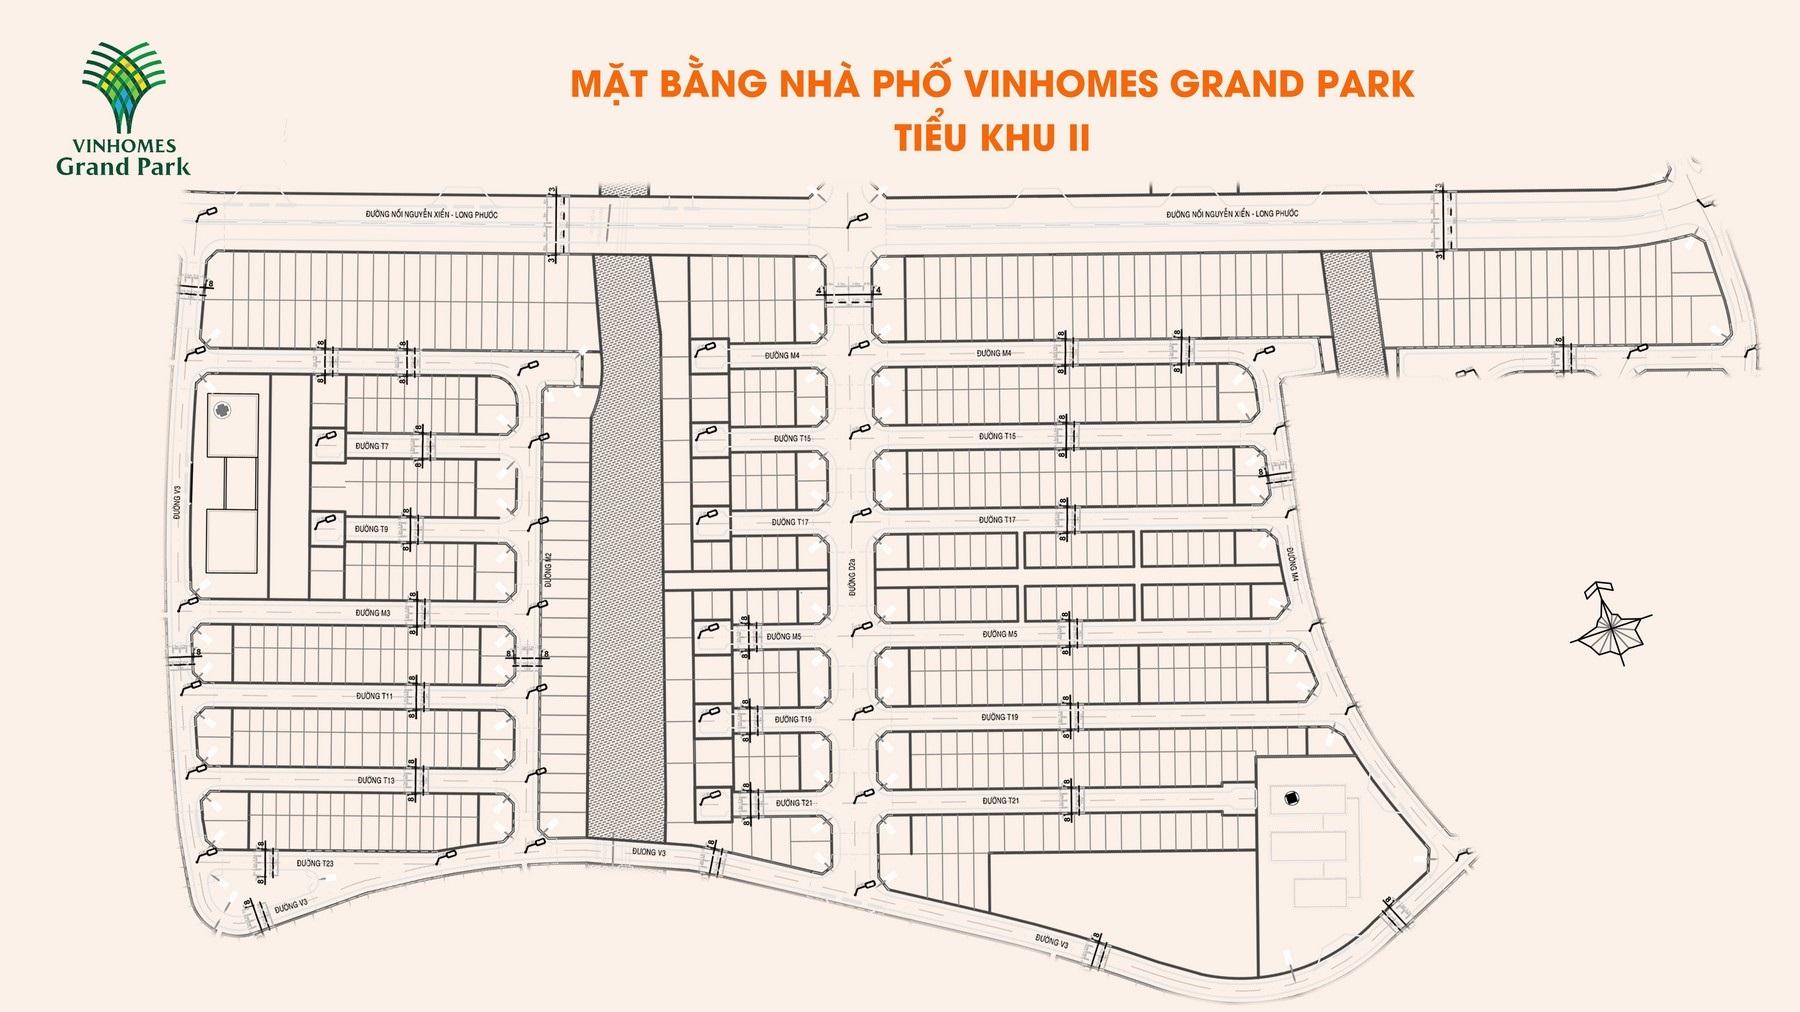 Mặt bằng The Manhattan Glory Vinhomes Grand Park, quận 9, TP HCM